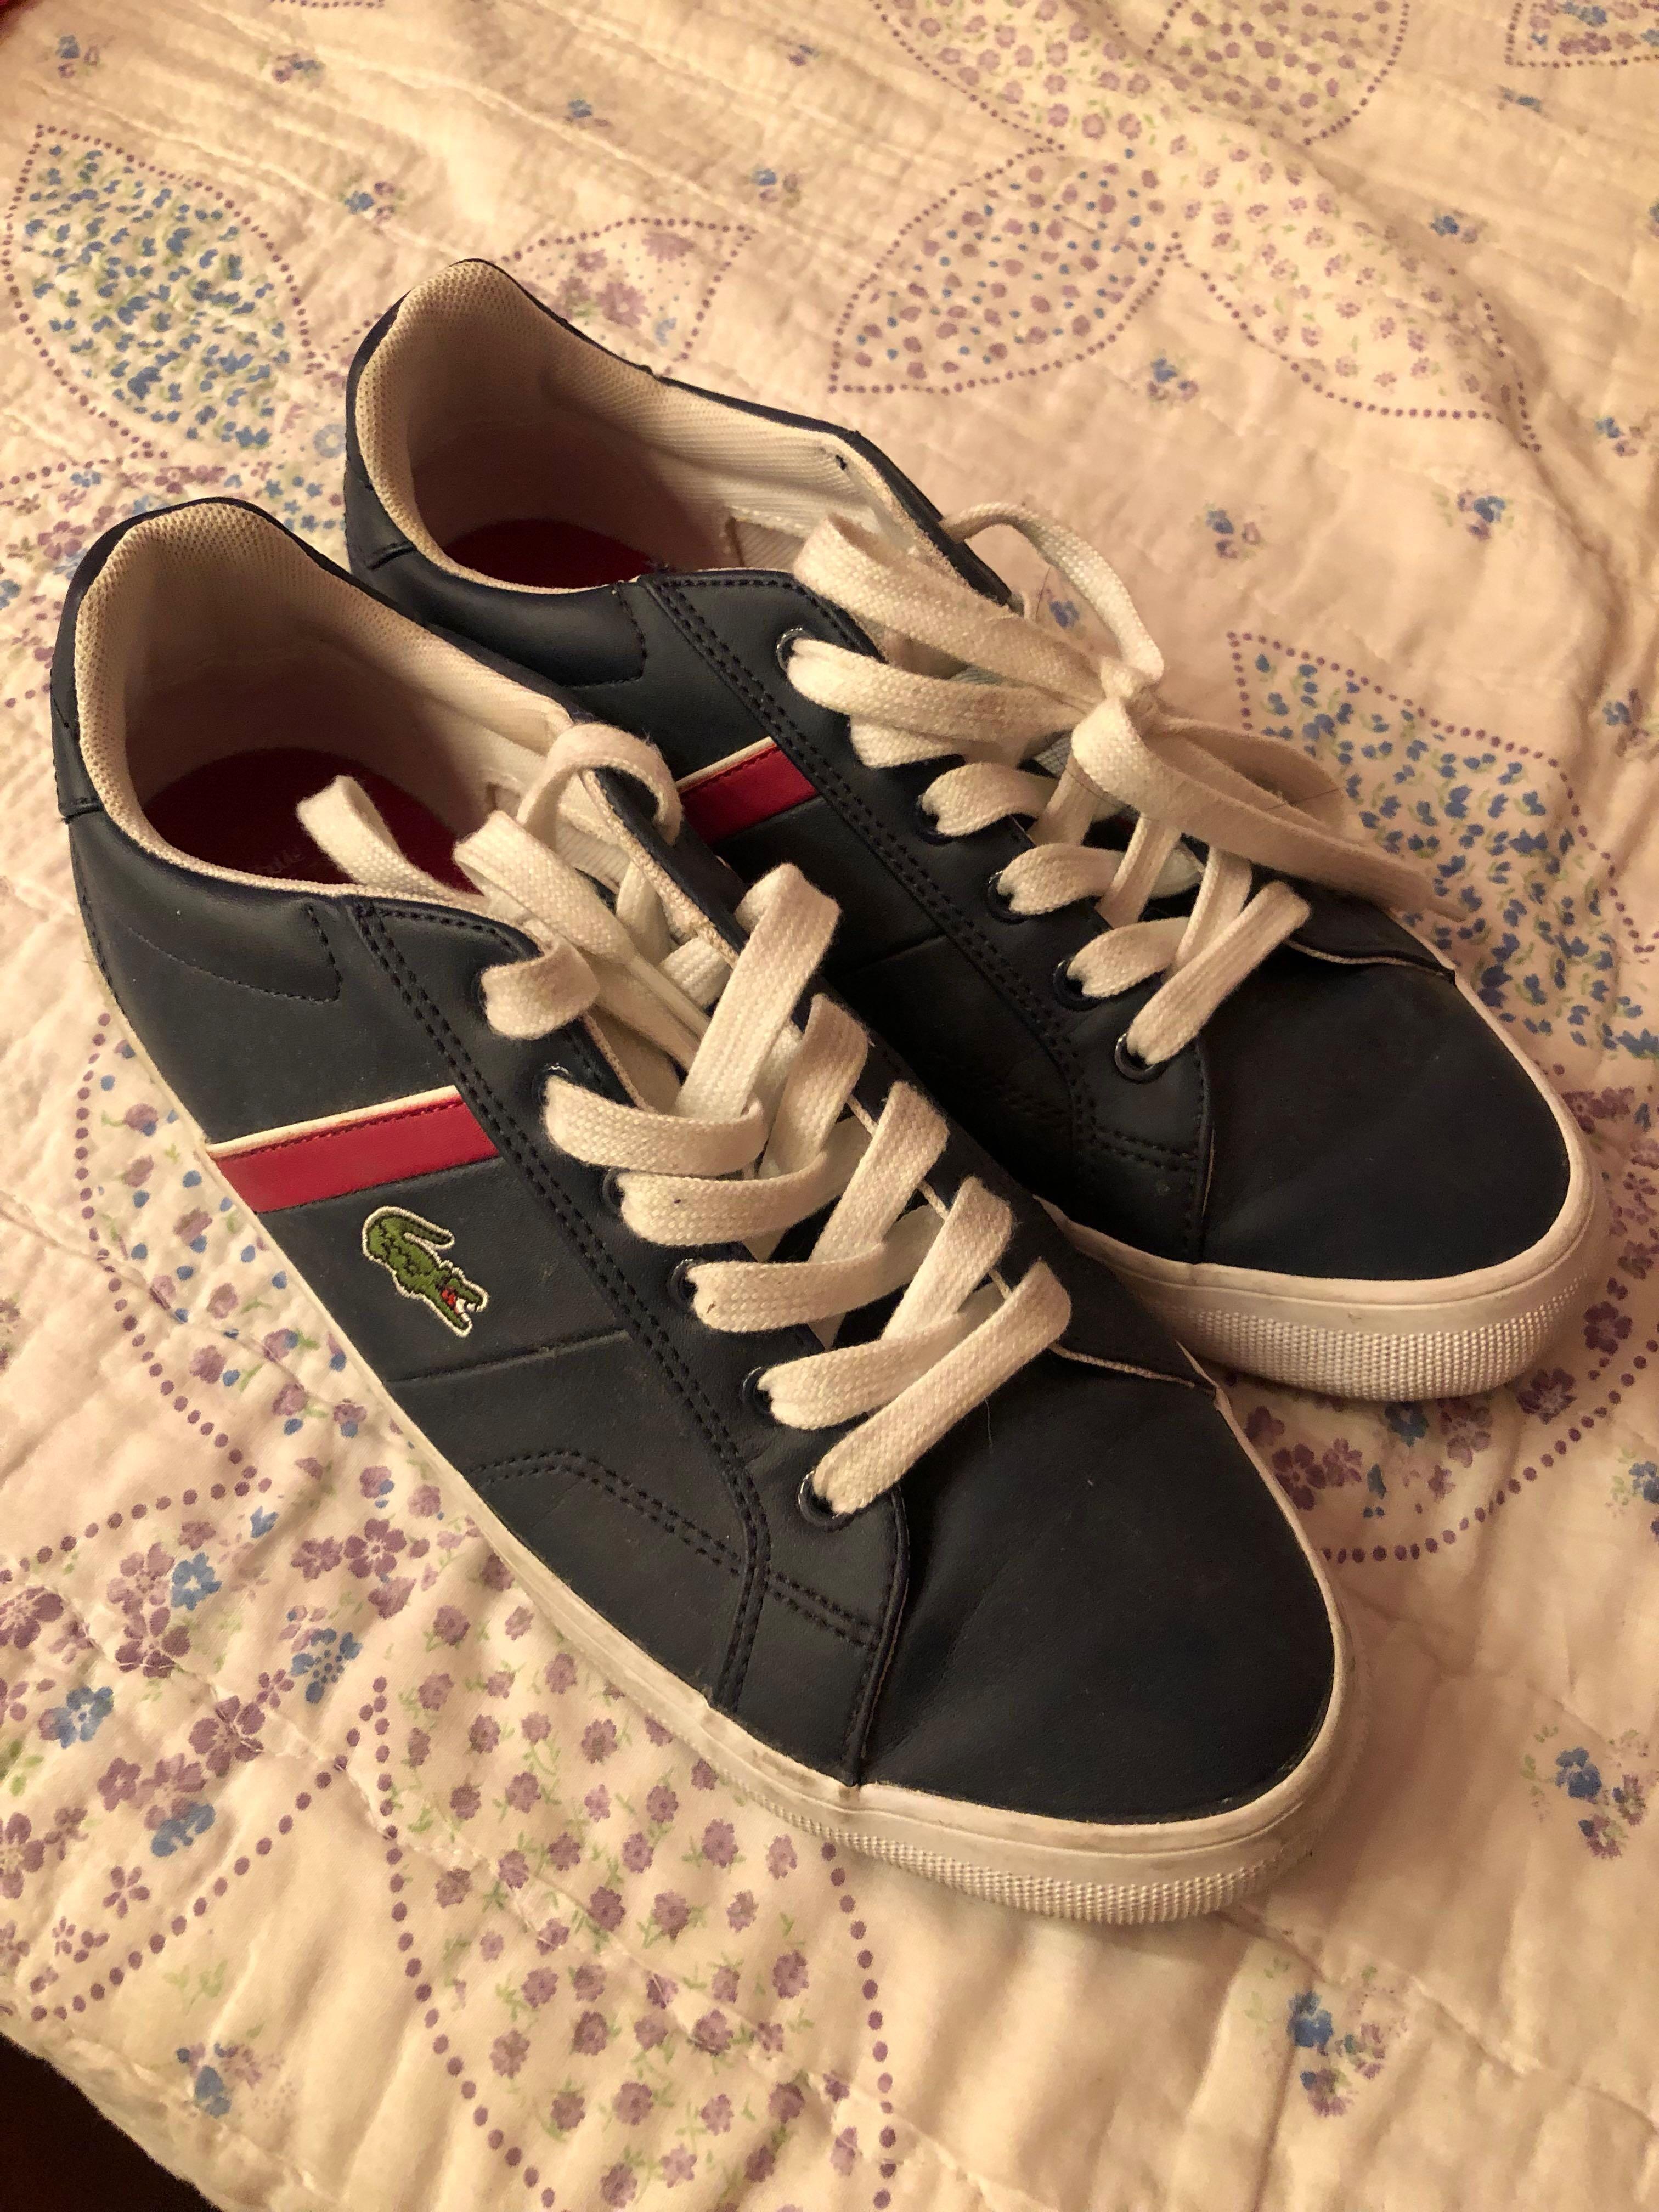 b9783715d4d057 Home · Women s Fashion · Shoes. photo photo photo photo photo